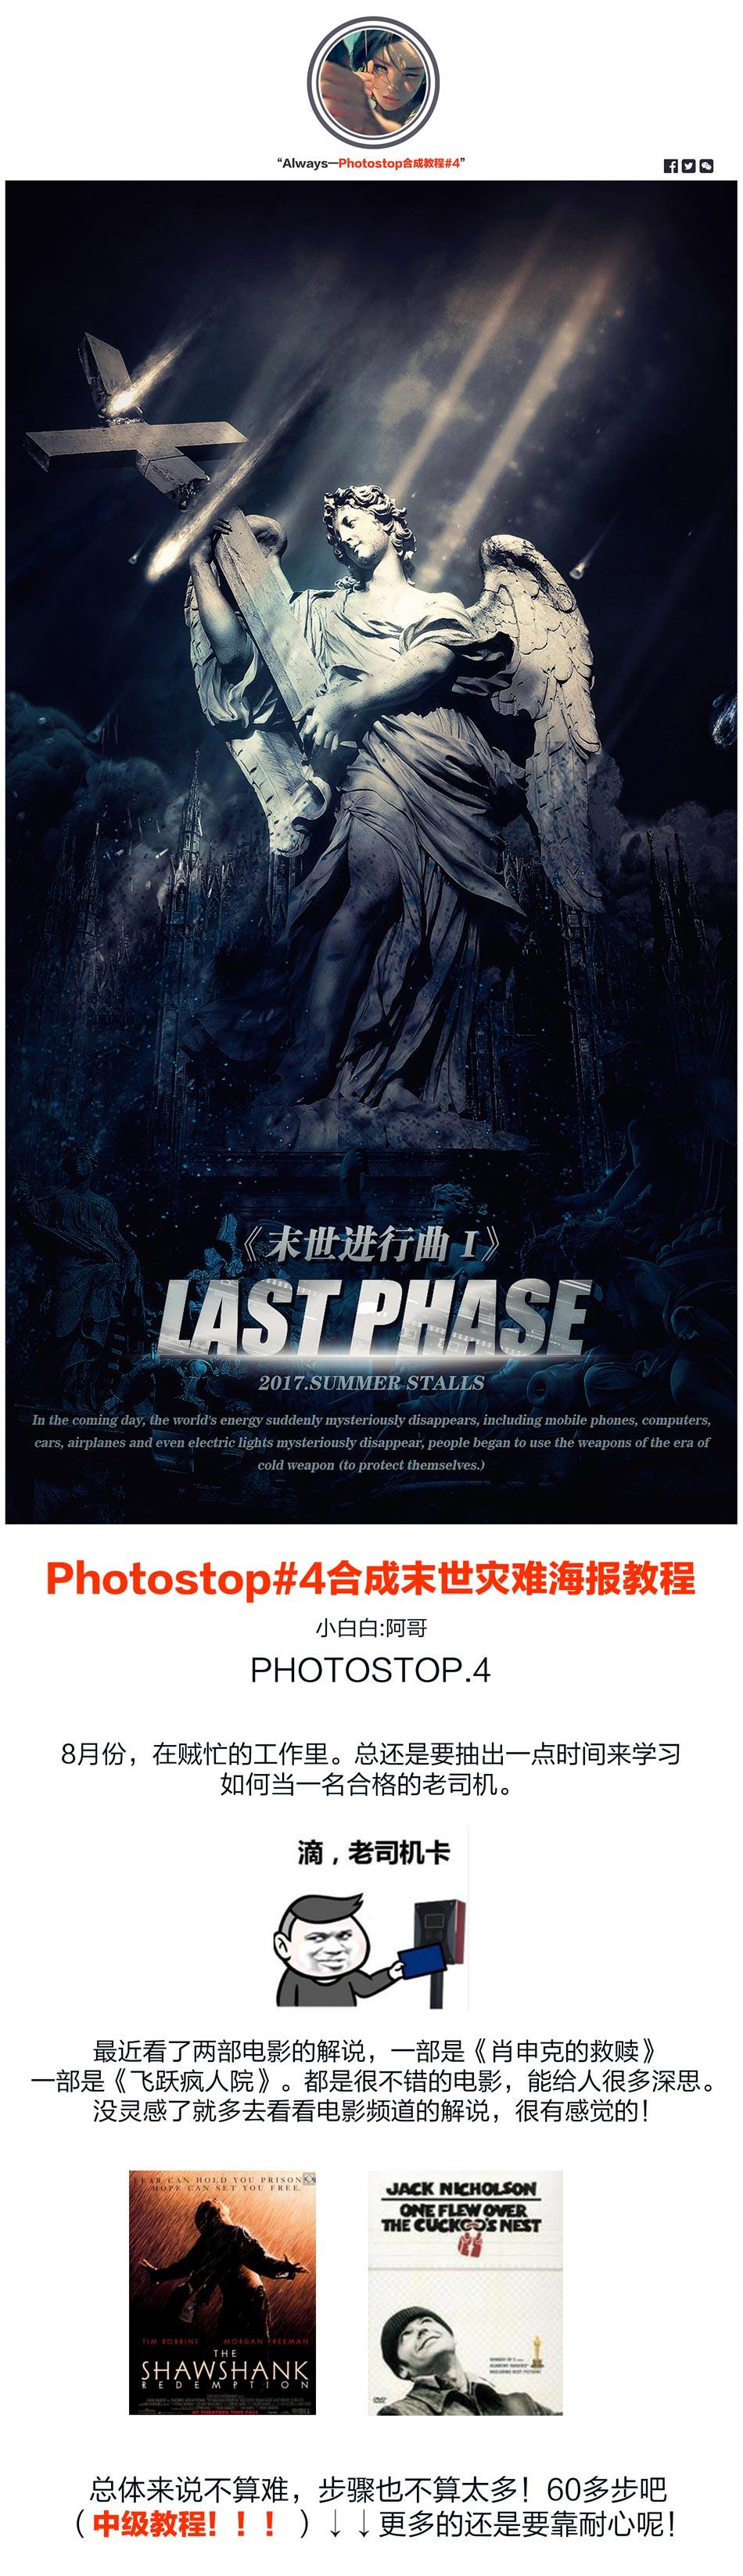 Photoshop合成世界末日类电影宣传海报教程,PS教程,思缘教程网